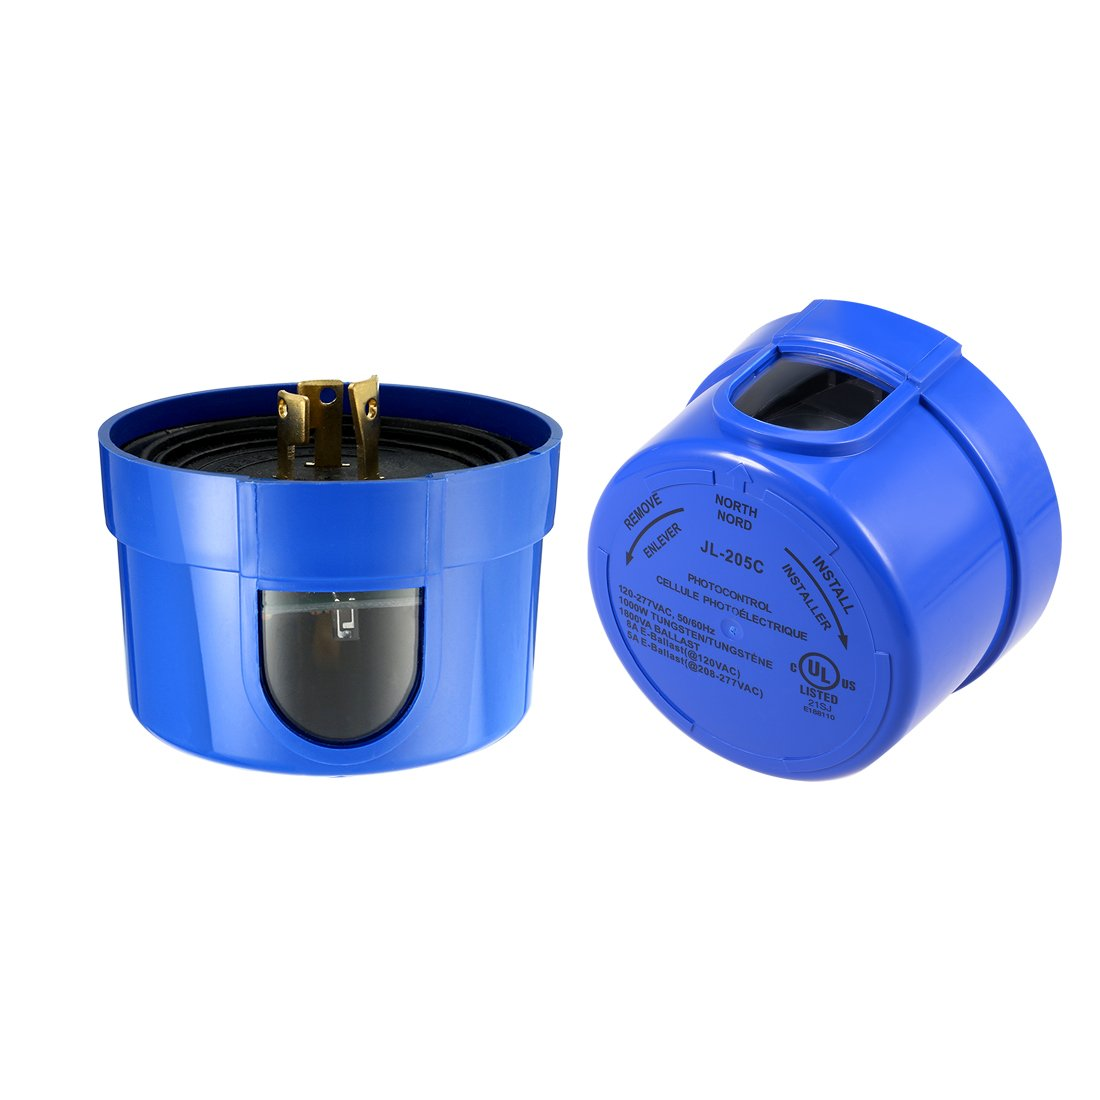 uxcell 2Pcs Photocell Sensor, IP65 Waterproof Automatic Auto On Off Photocell Street Light Sensor Switch